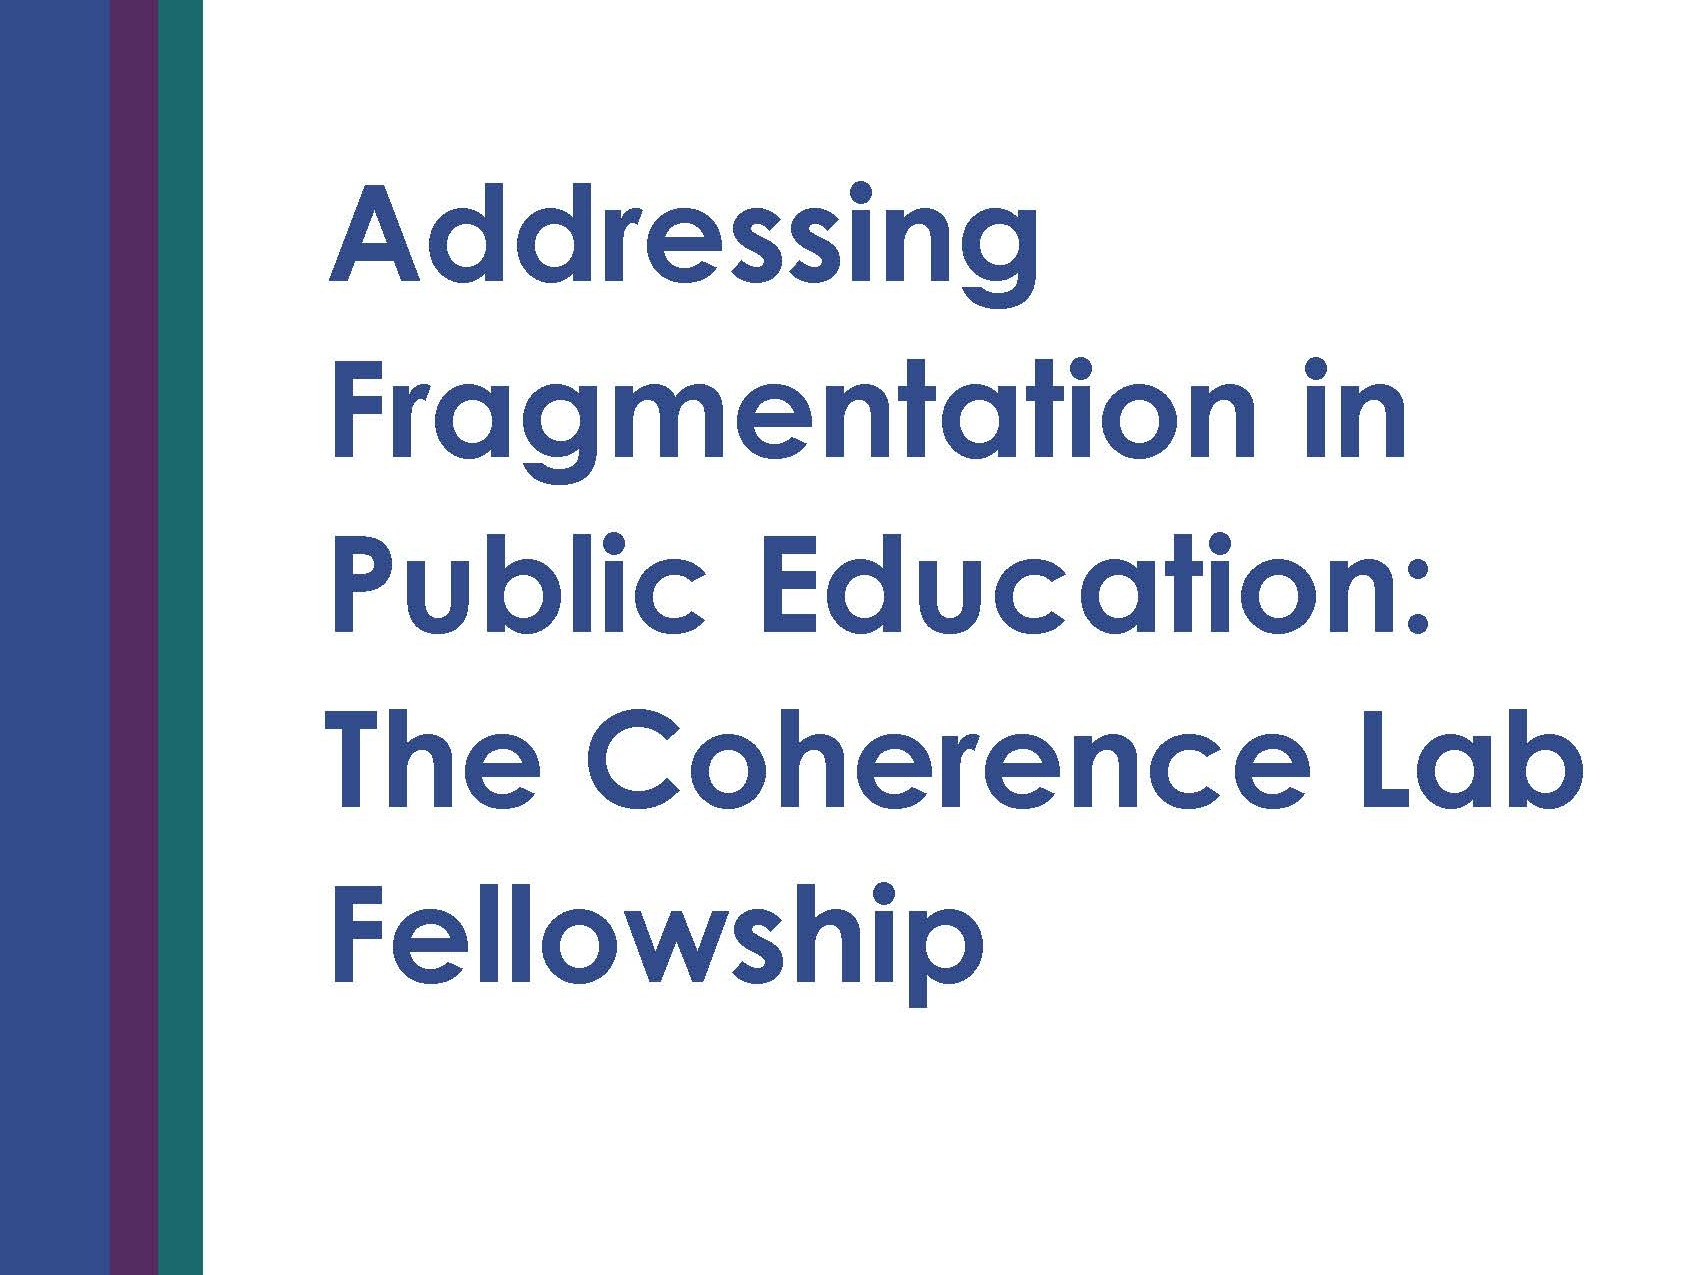 Addressing-Fragmentation-in-Public-Education-CLF_Final_Page_01.jpg